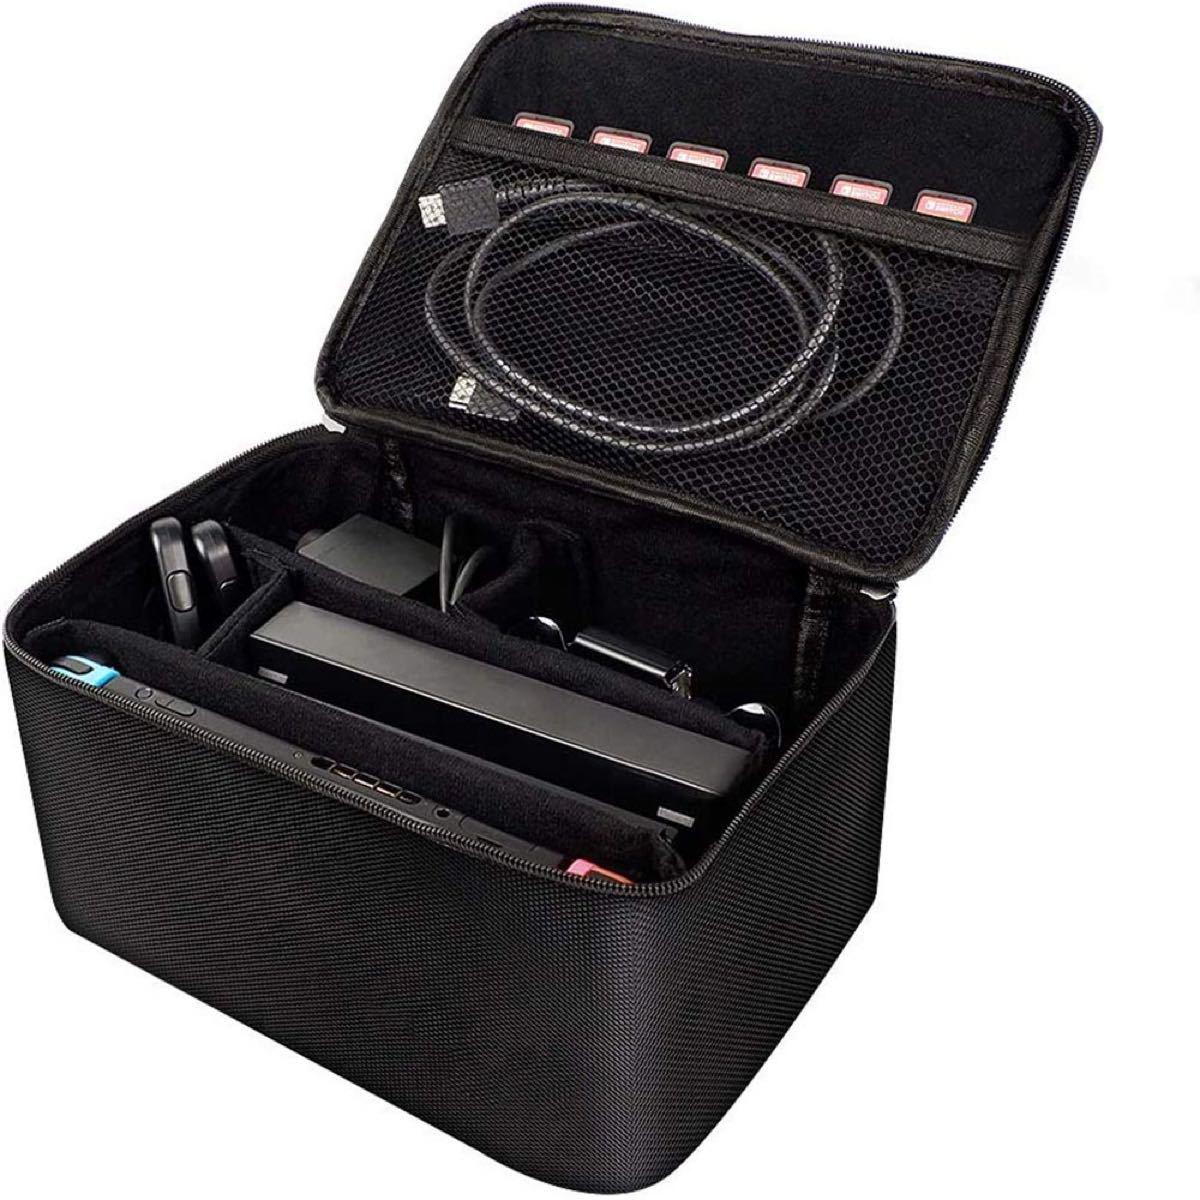 Switch専用収納バッグ スイッチ保護ケース 外出や旅行用収納バッグ 大容量 1680Dナイロン素材 防塵 防汚 防水 耐衝撃